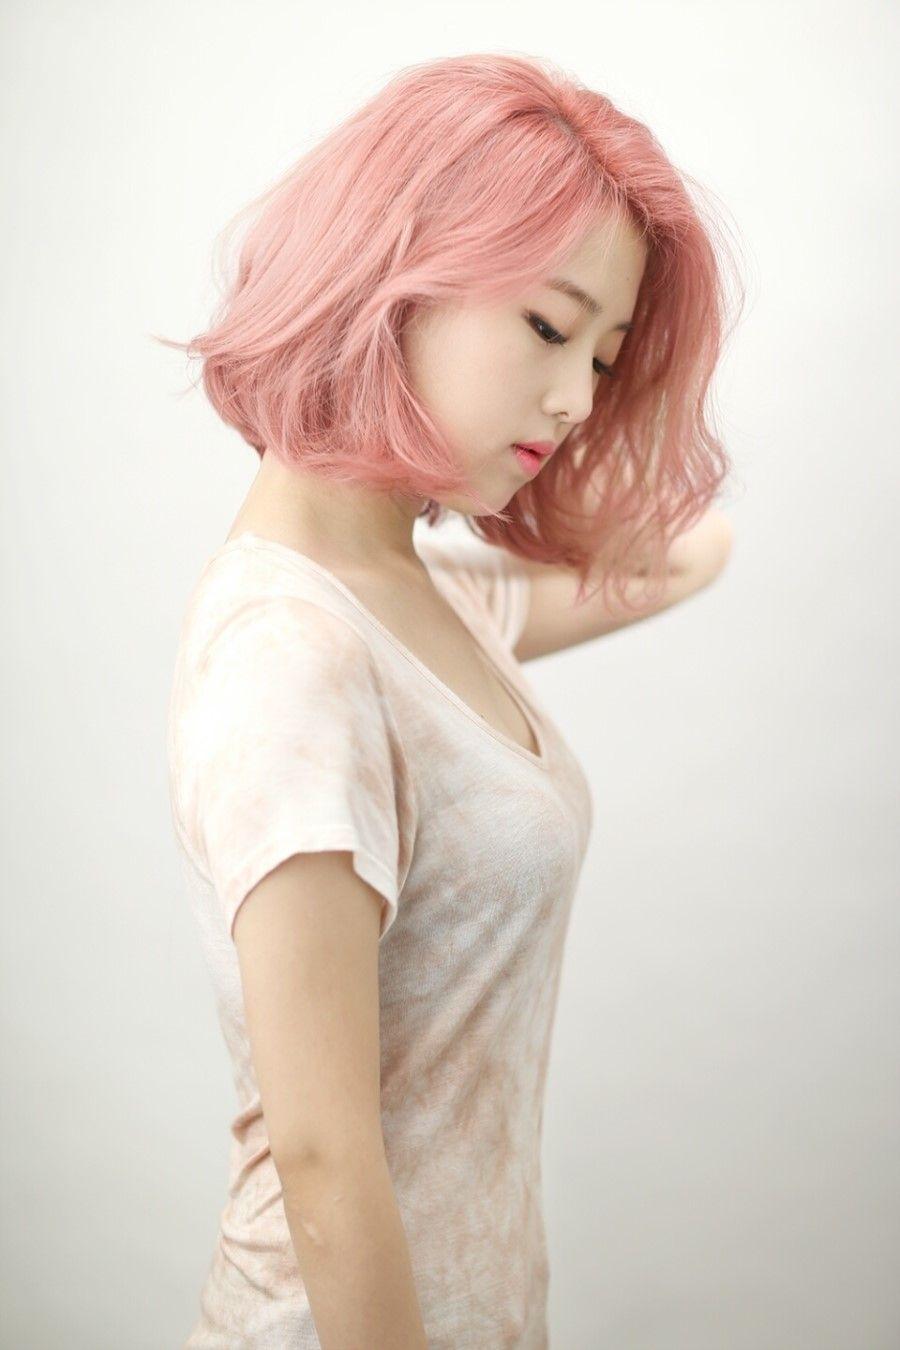 porn anime Pink hair